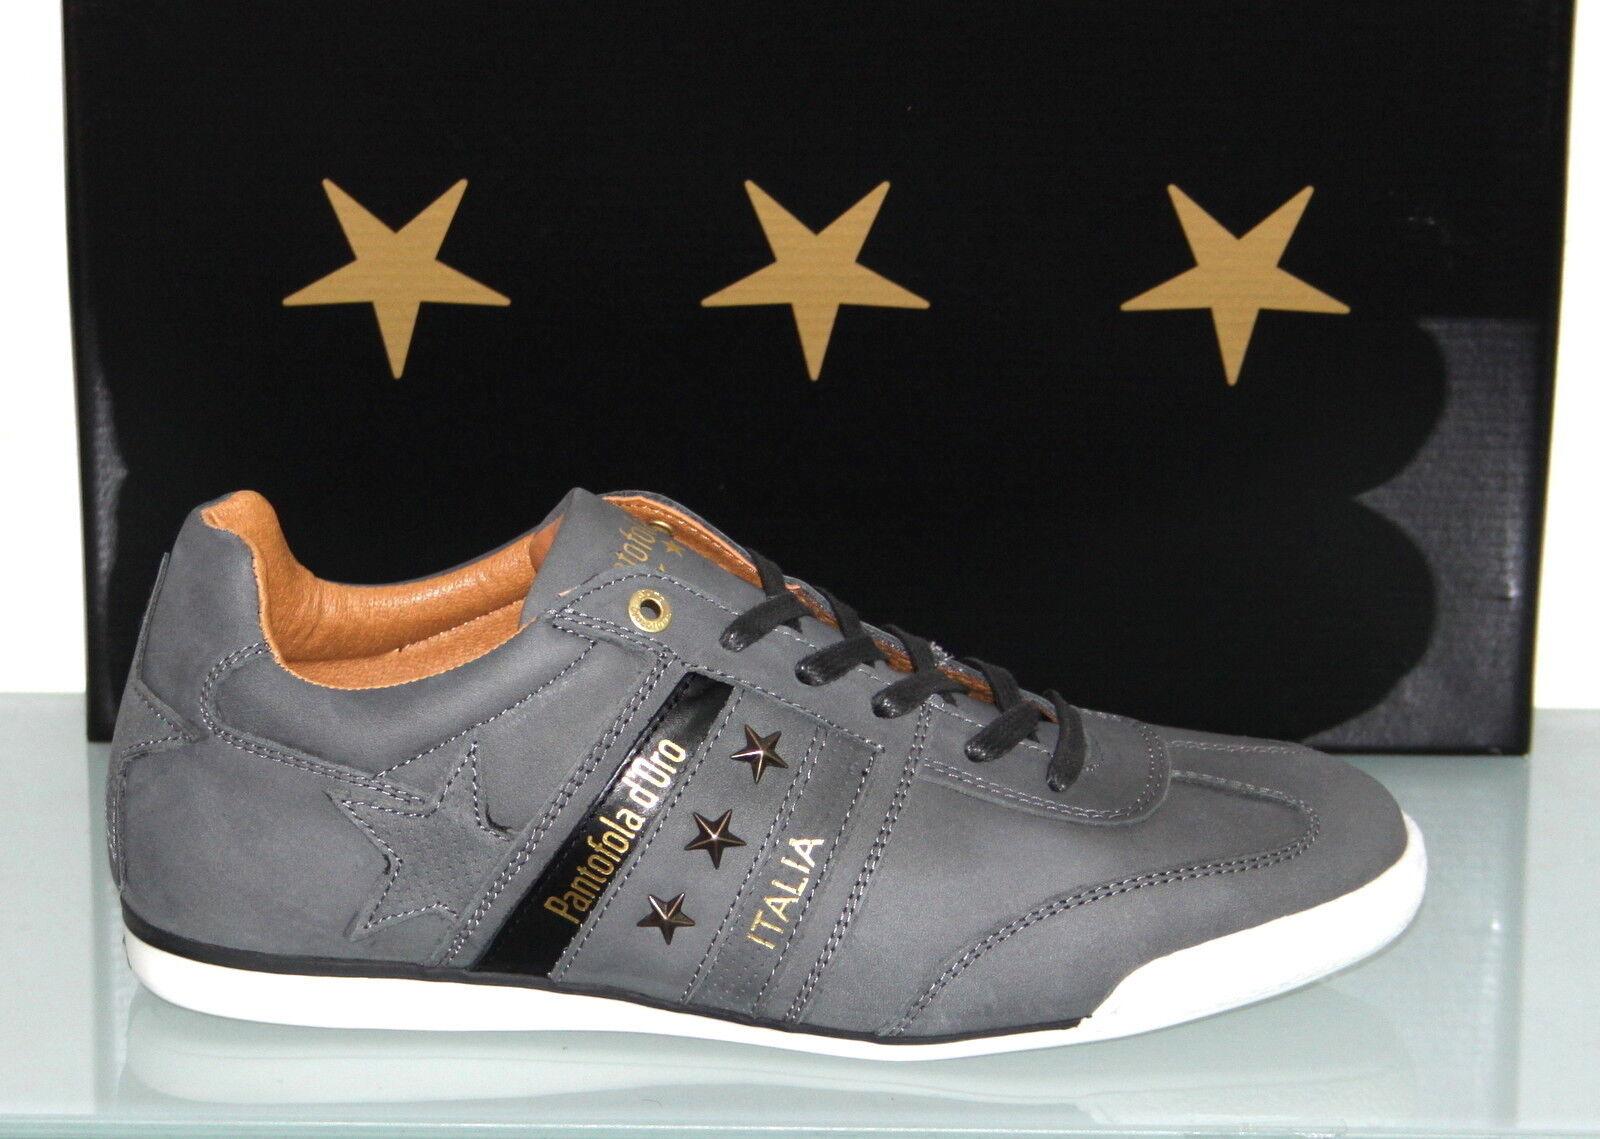 PANTOFOLA D´ORO Leder-Sneaker - IMOLA FUNKY Uomo Niedrig Dark Shadow - Neu&OVP